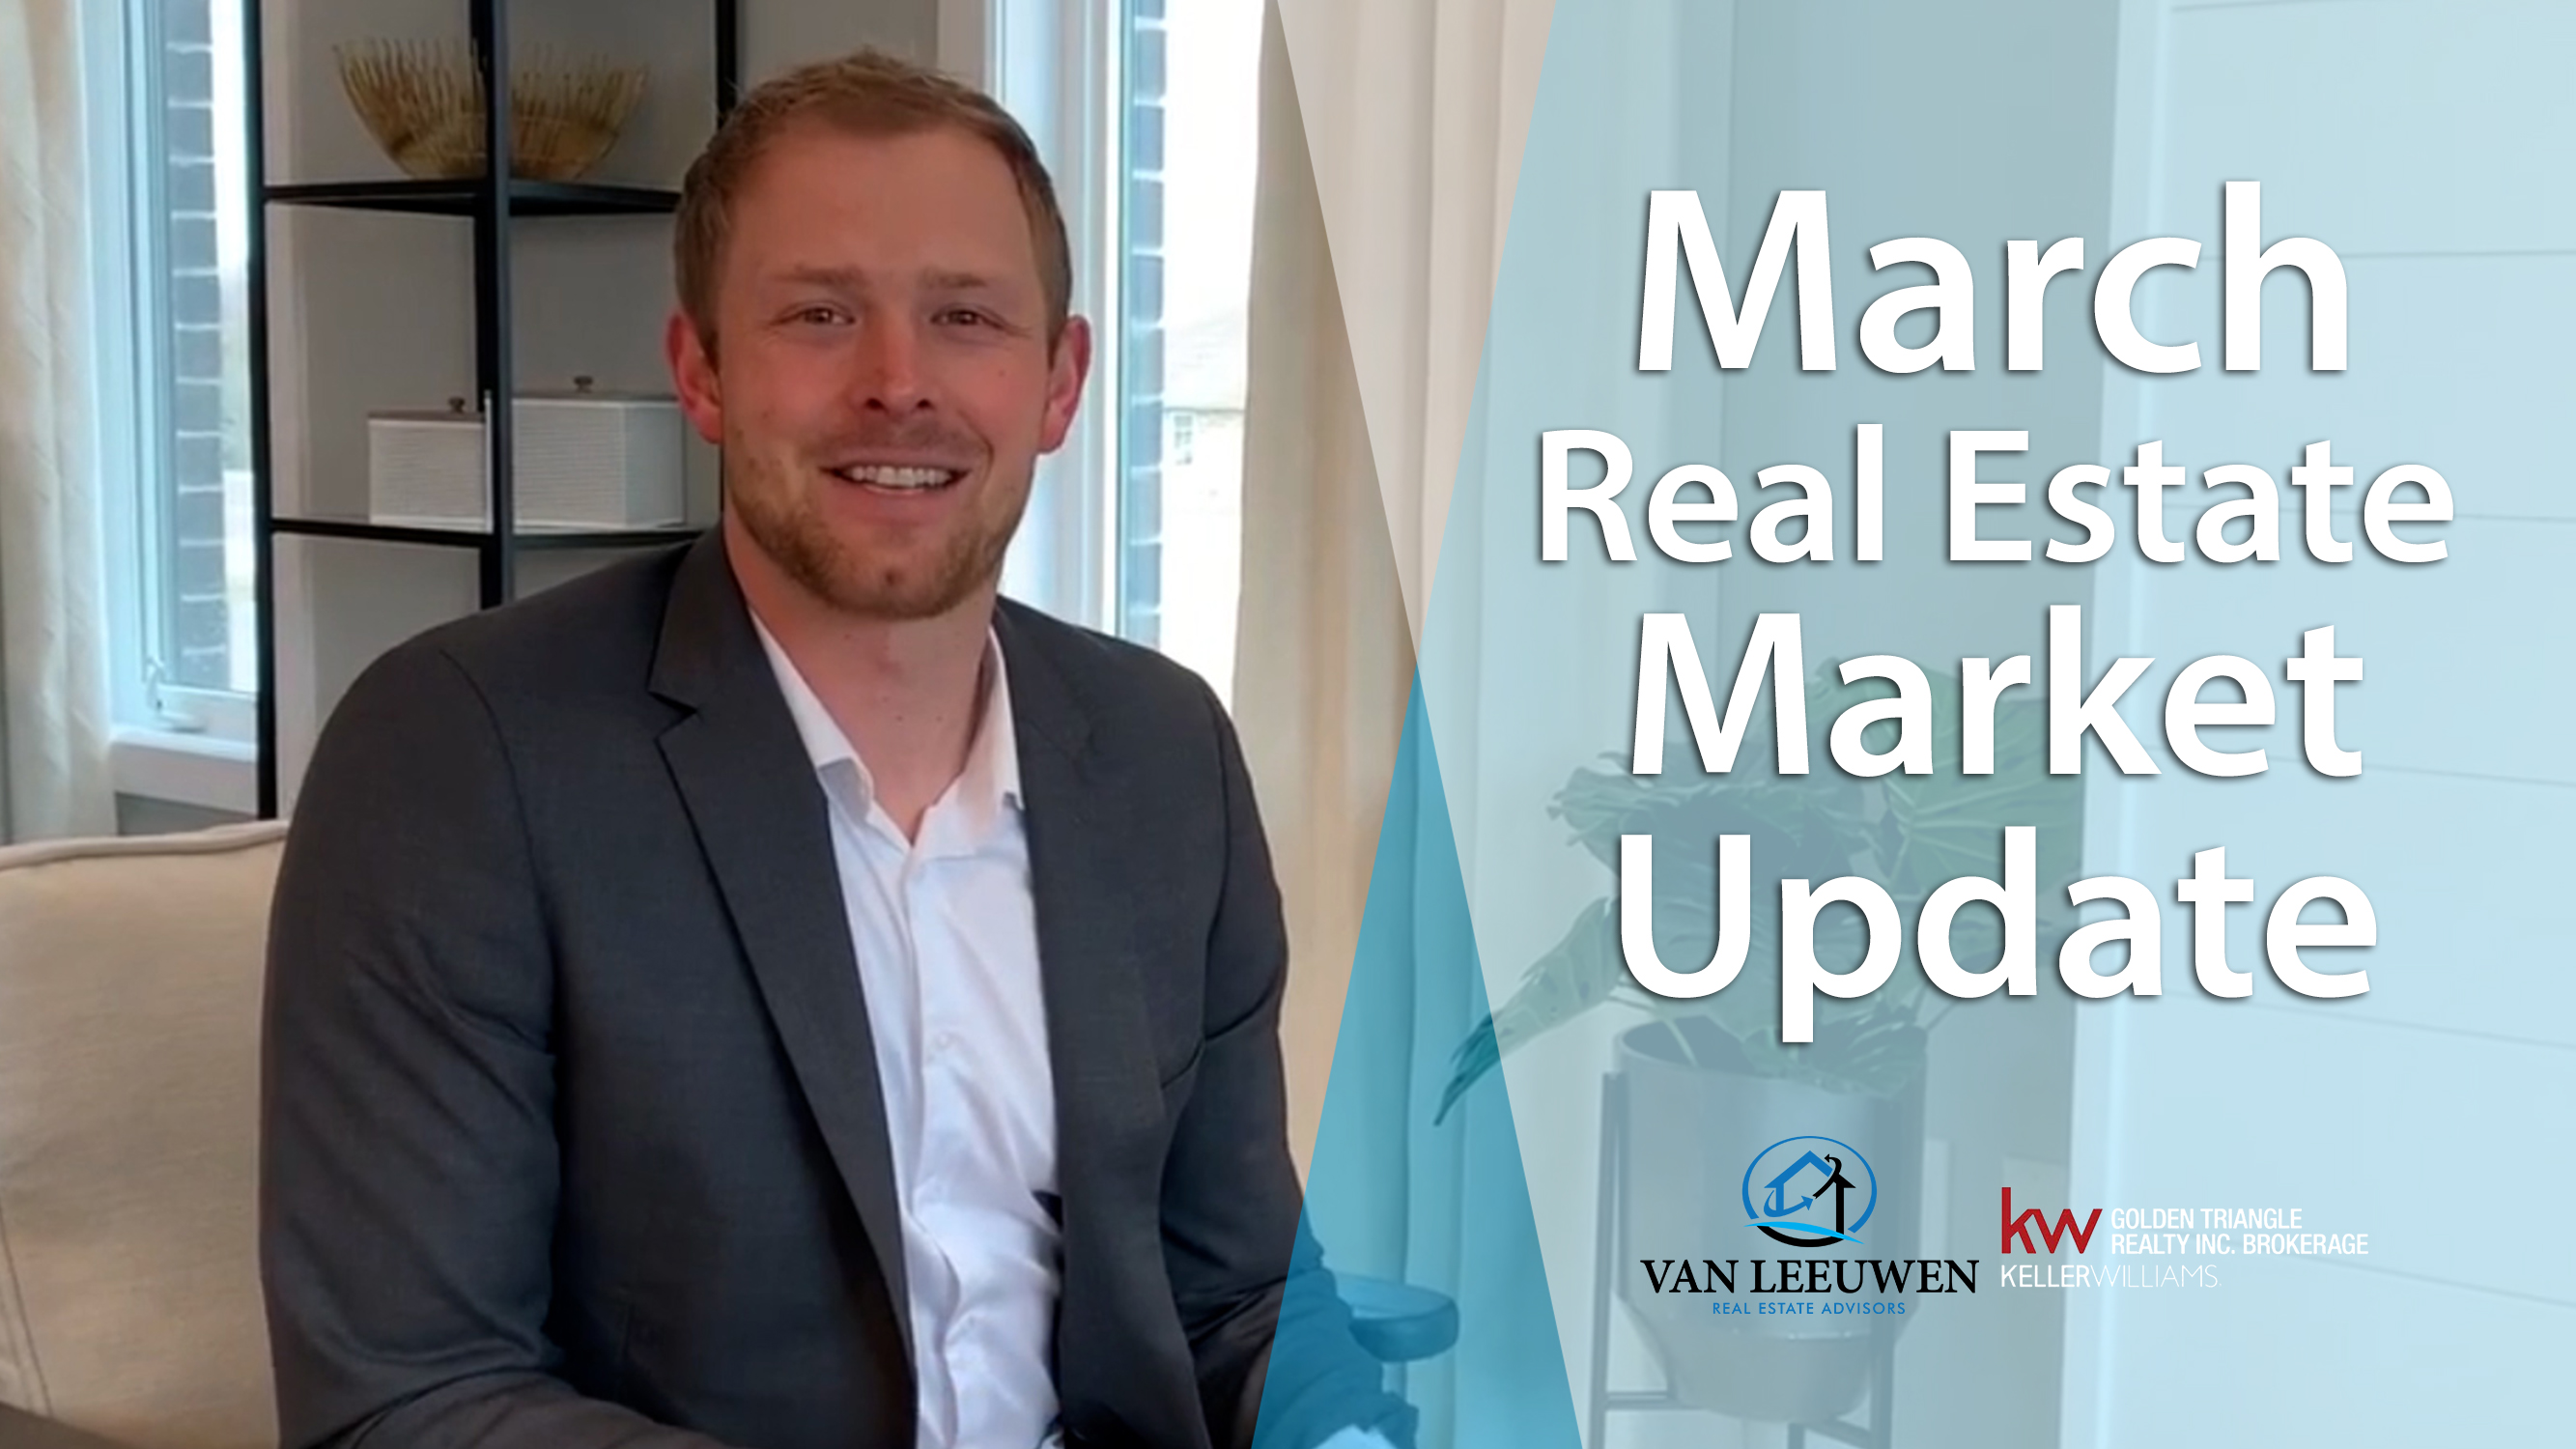 March Real Estate Market Update